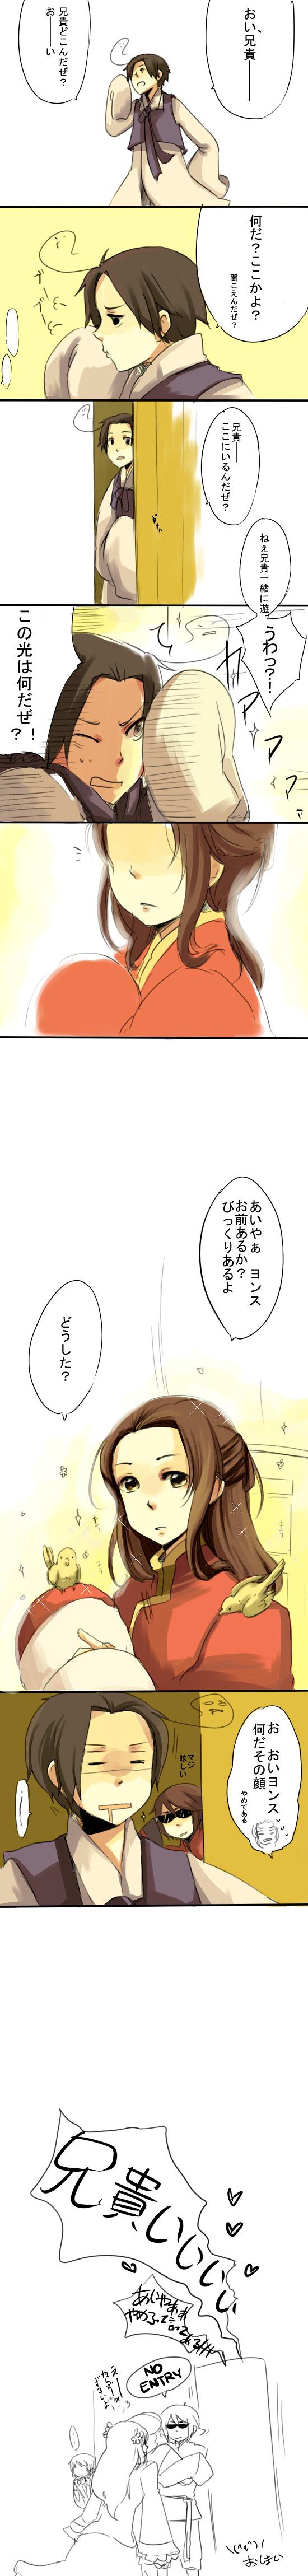 Tags: Anime, Ryo-hakkai, Axis Powers: Hetalia, Hong Kong, South Korea, Japan, Taiwan, China, Pixiv, Comic, Asian Countries